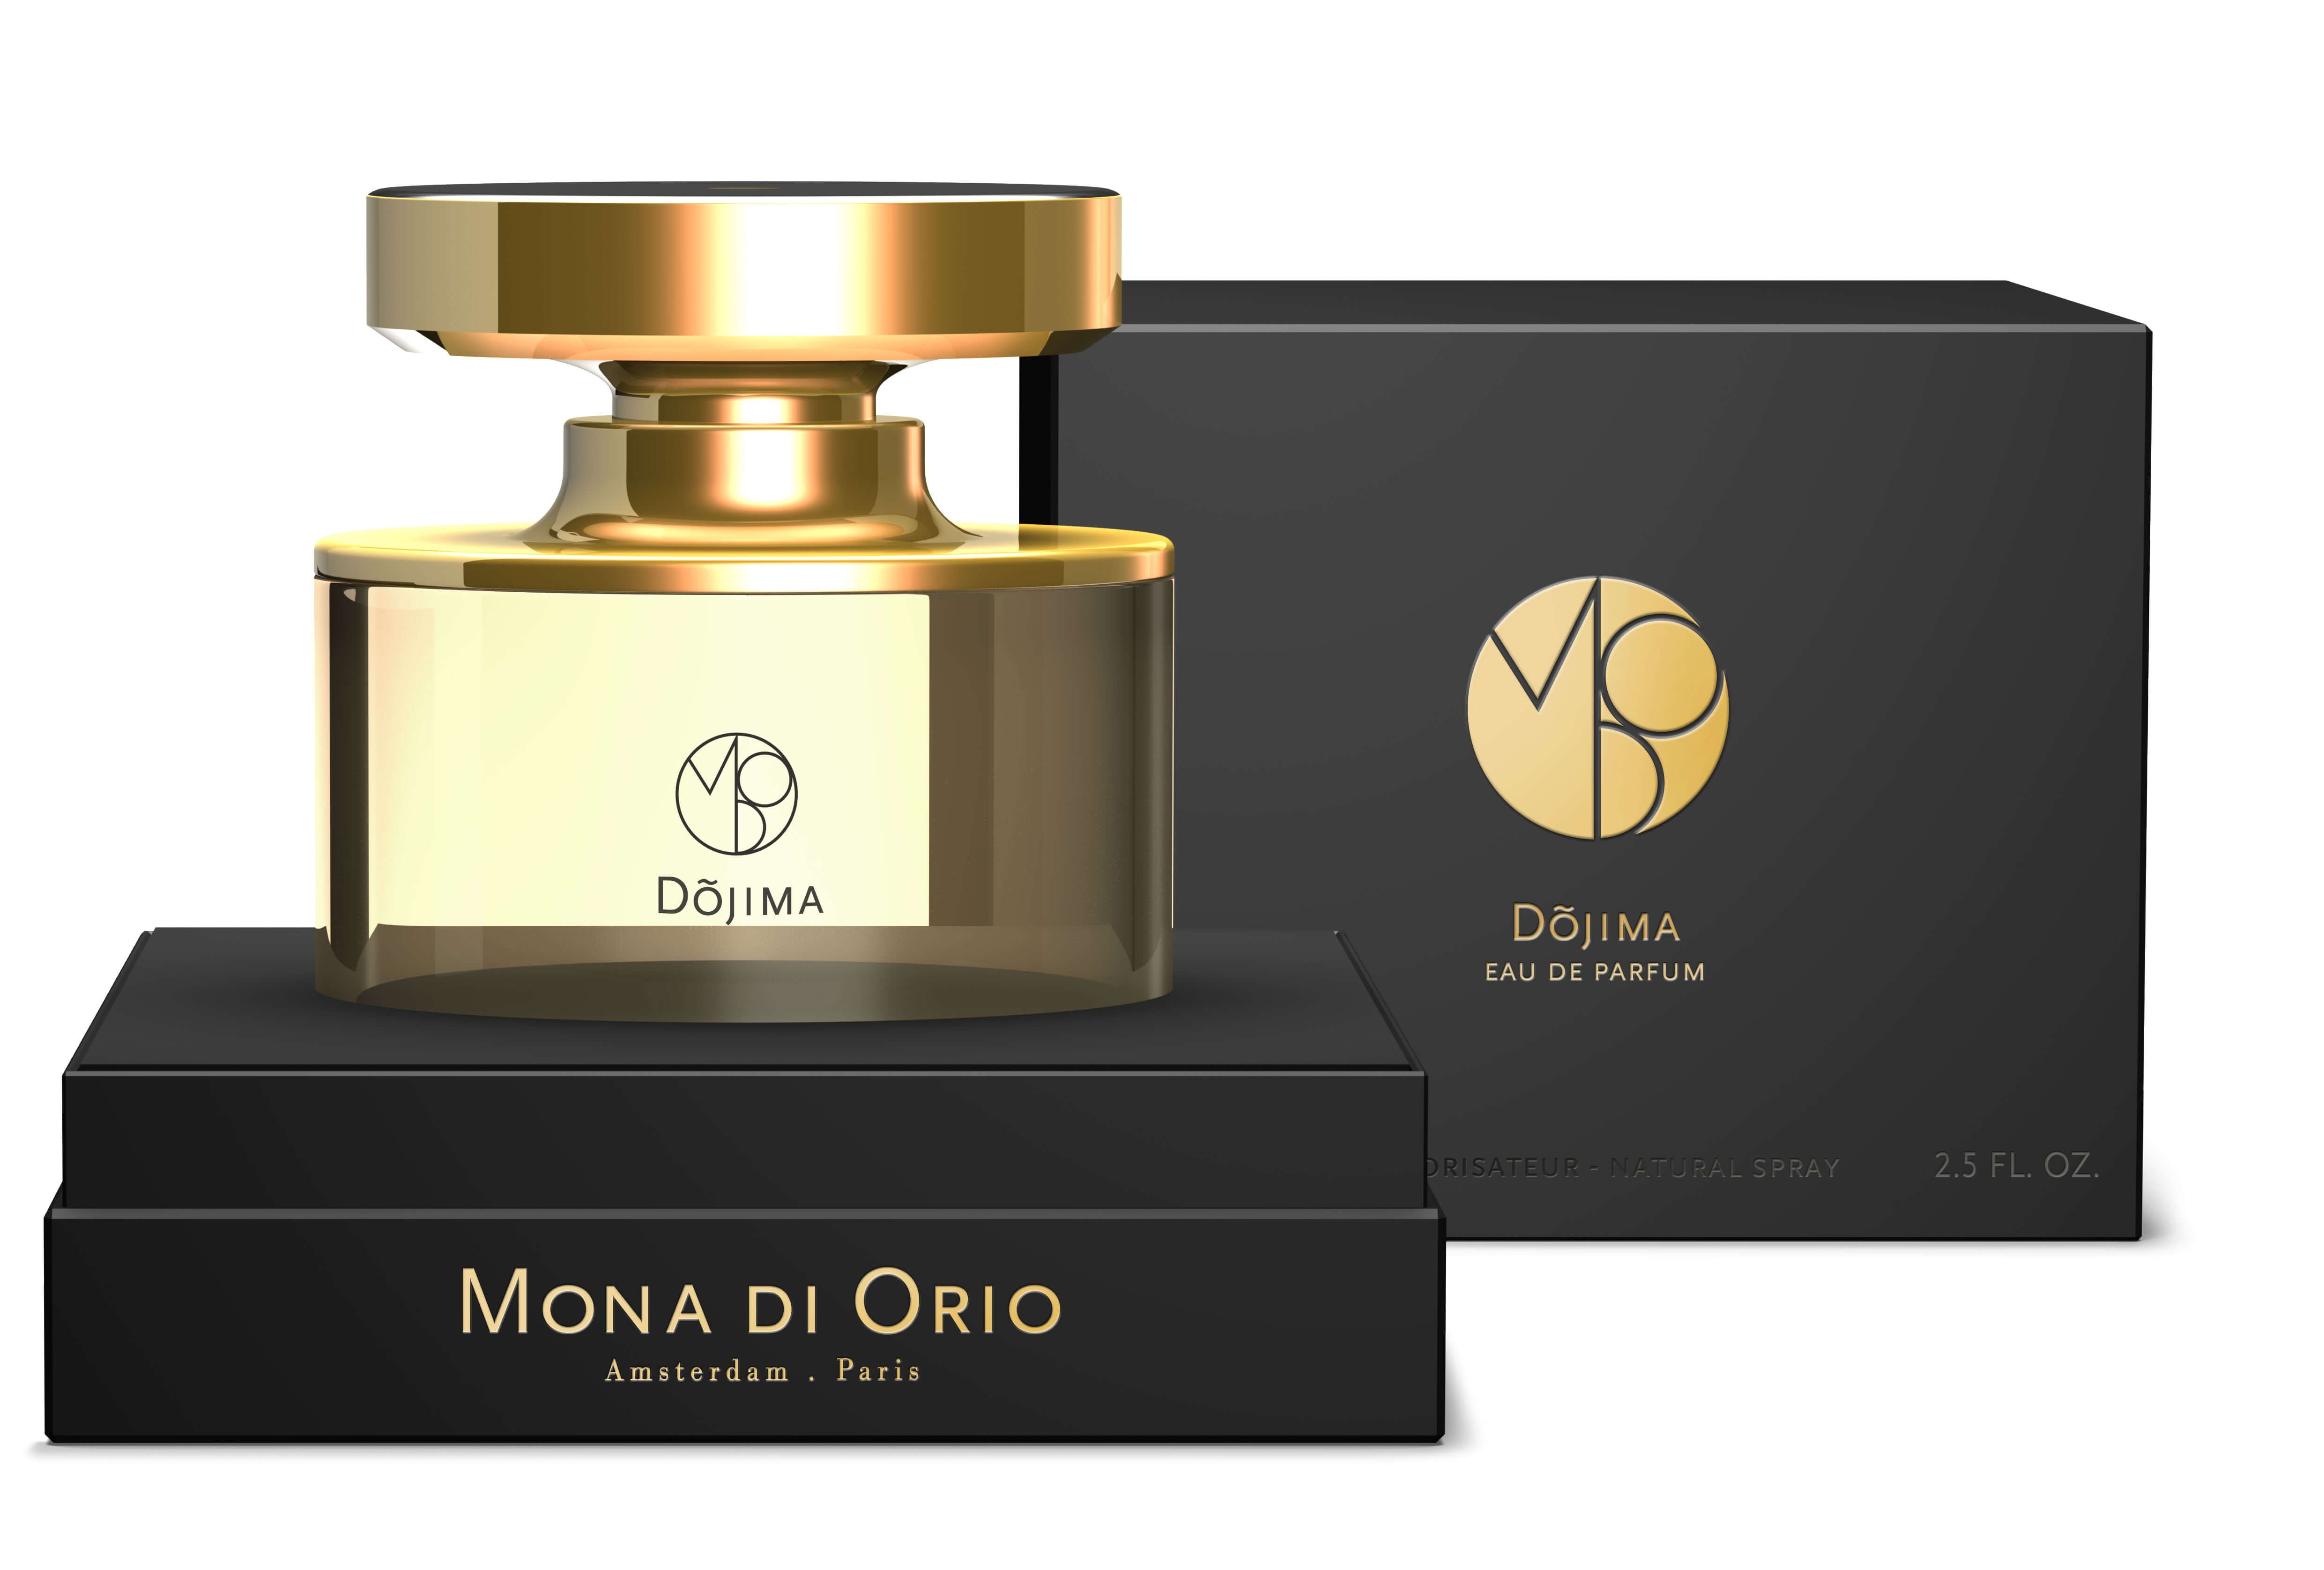 9e7aa8bdb Mona di Orio Dojima Edp 75 ml | Mariabruna BeautyShopOnline